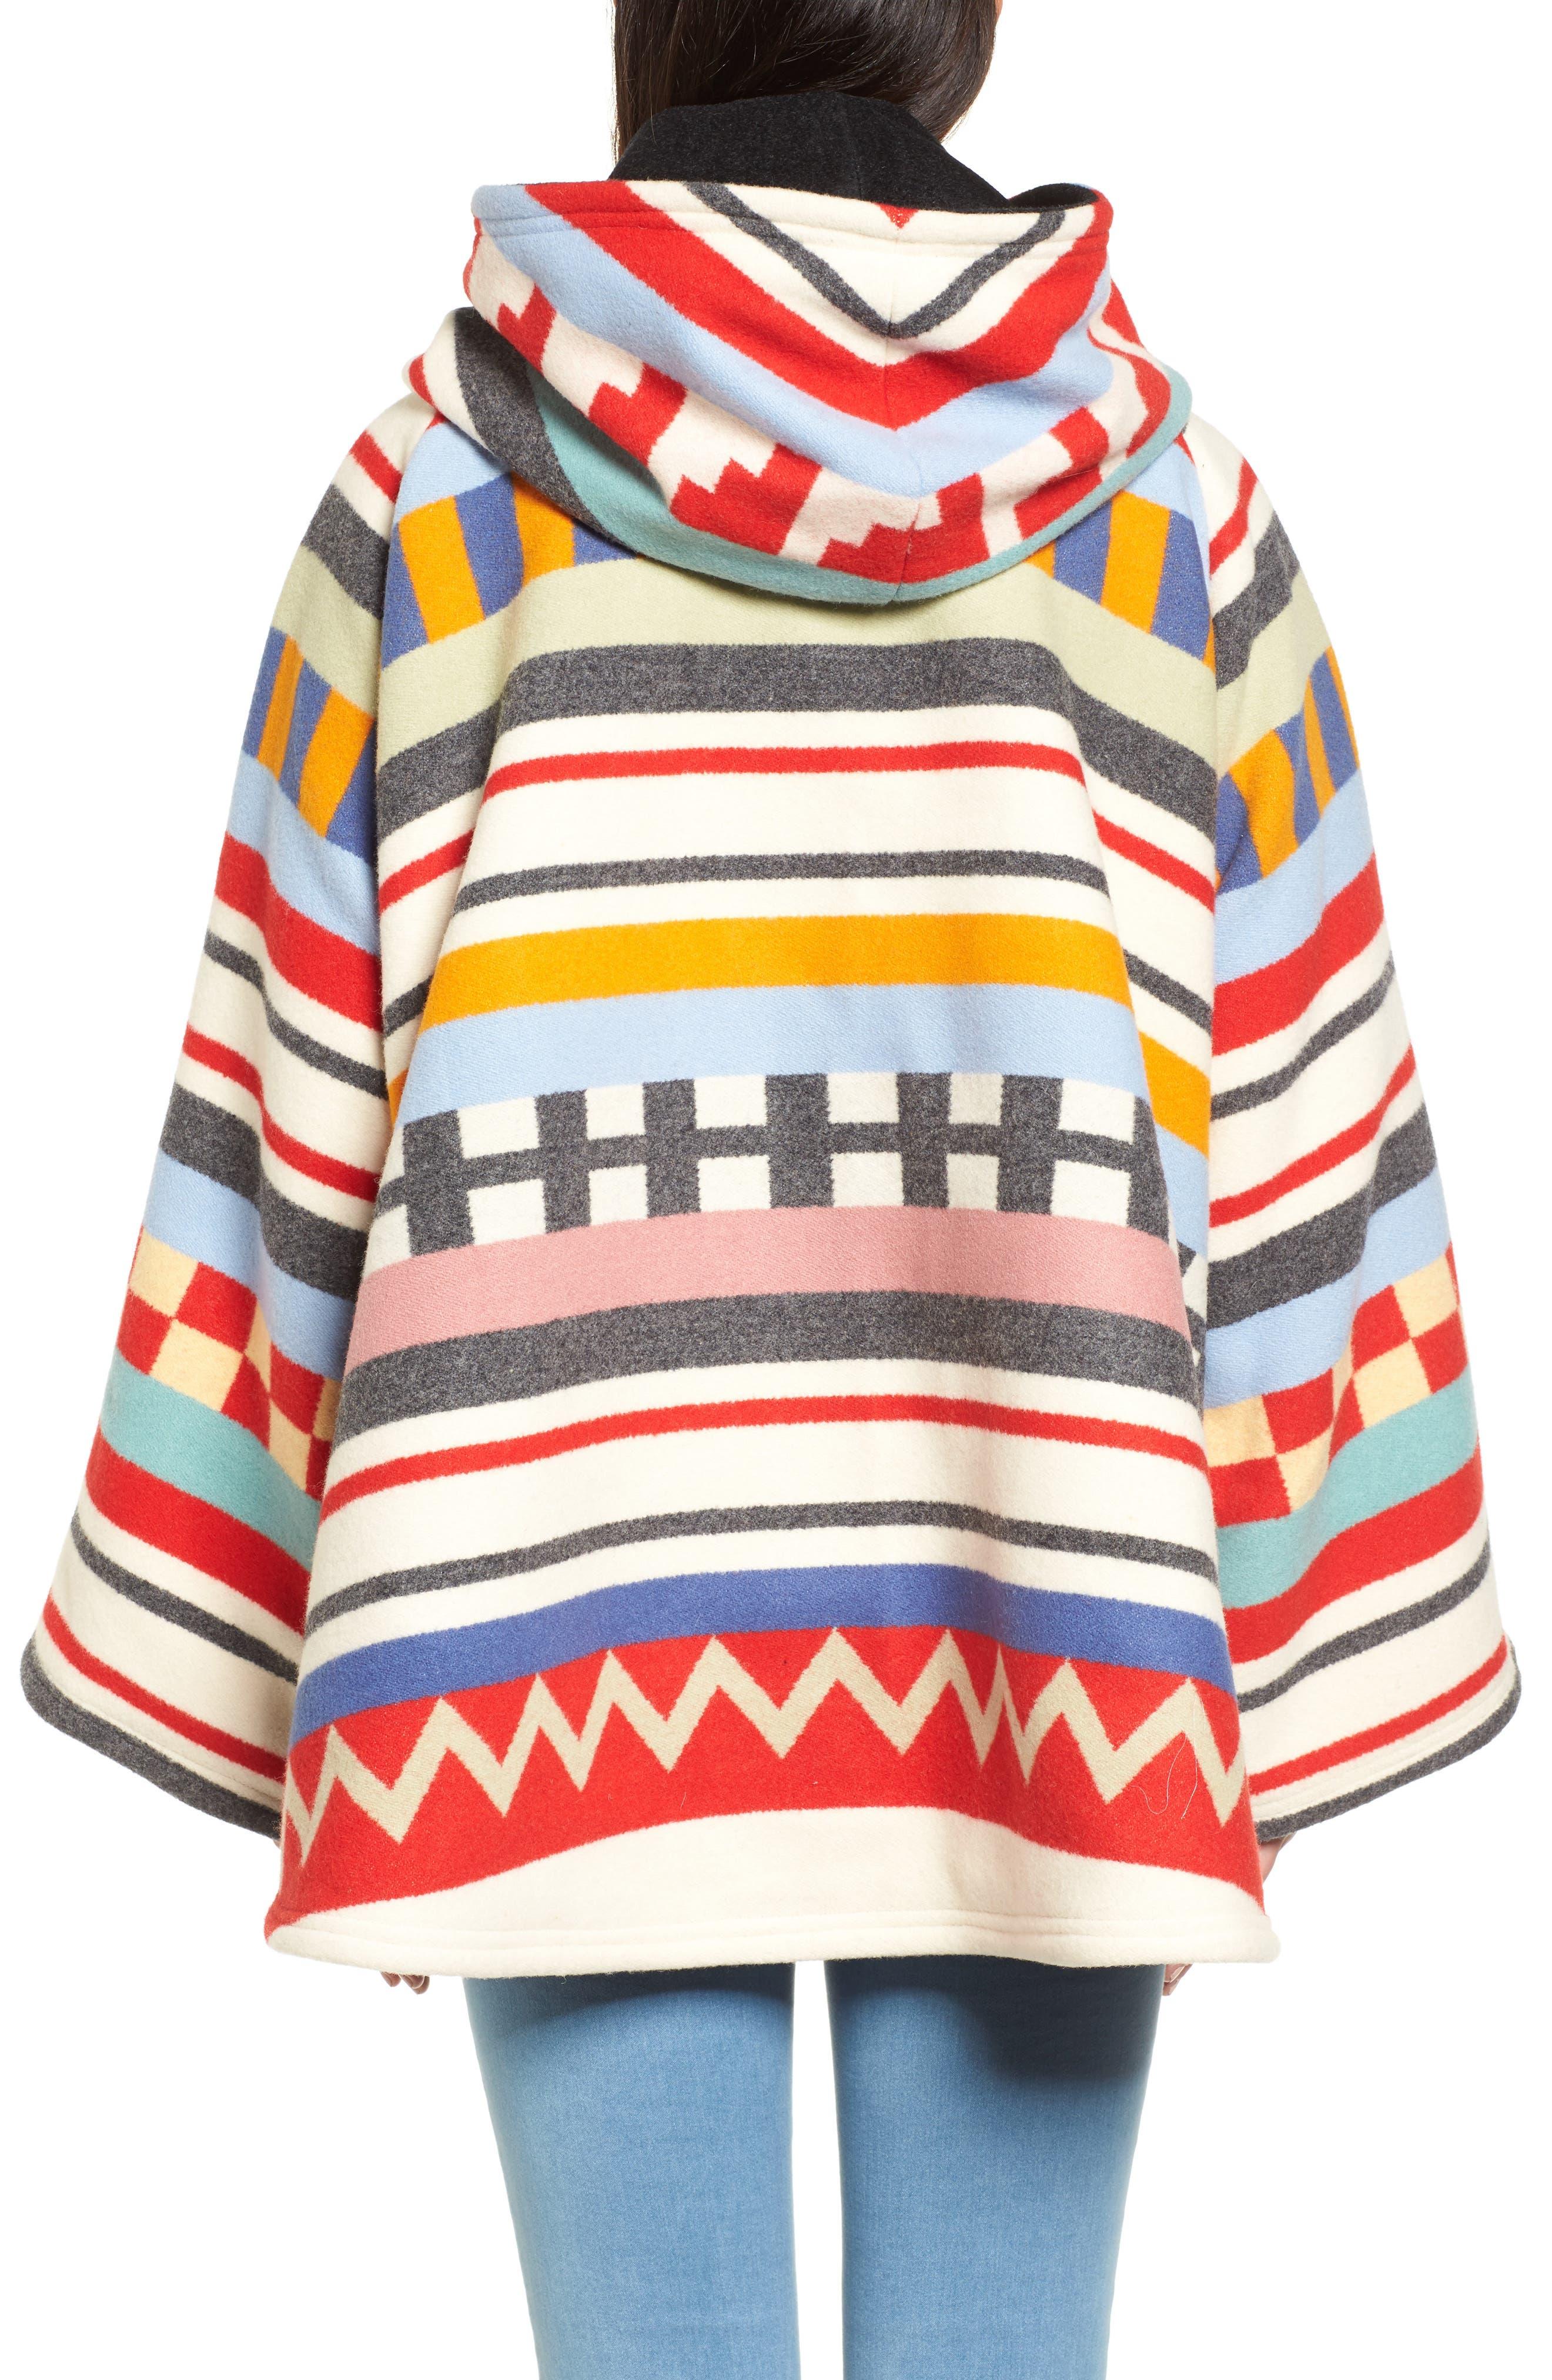 x Pendleton Wool Blend Hooded Cape,                             Alternate thumbnail 2, color,                             White Multi